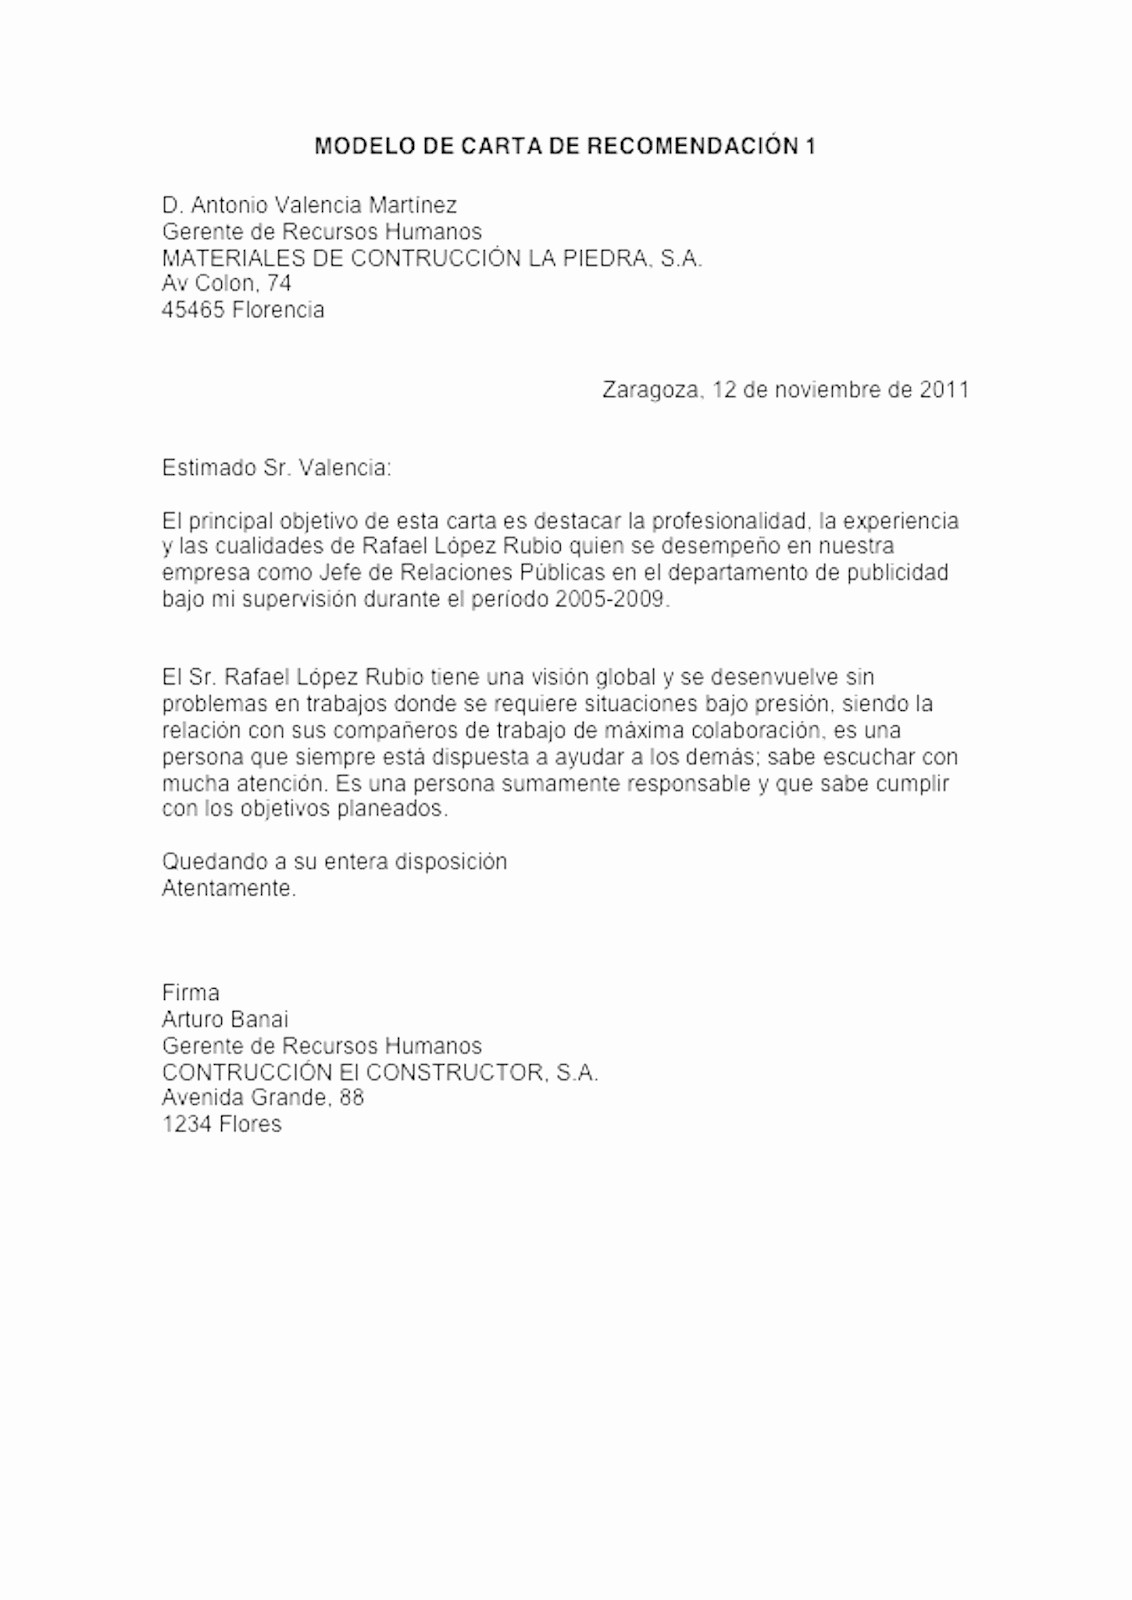 Modelos De Carta De Recomendacion Inspirational Carta De Re Endacion Personal Word Wood Scribd Mexico